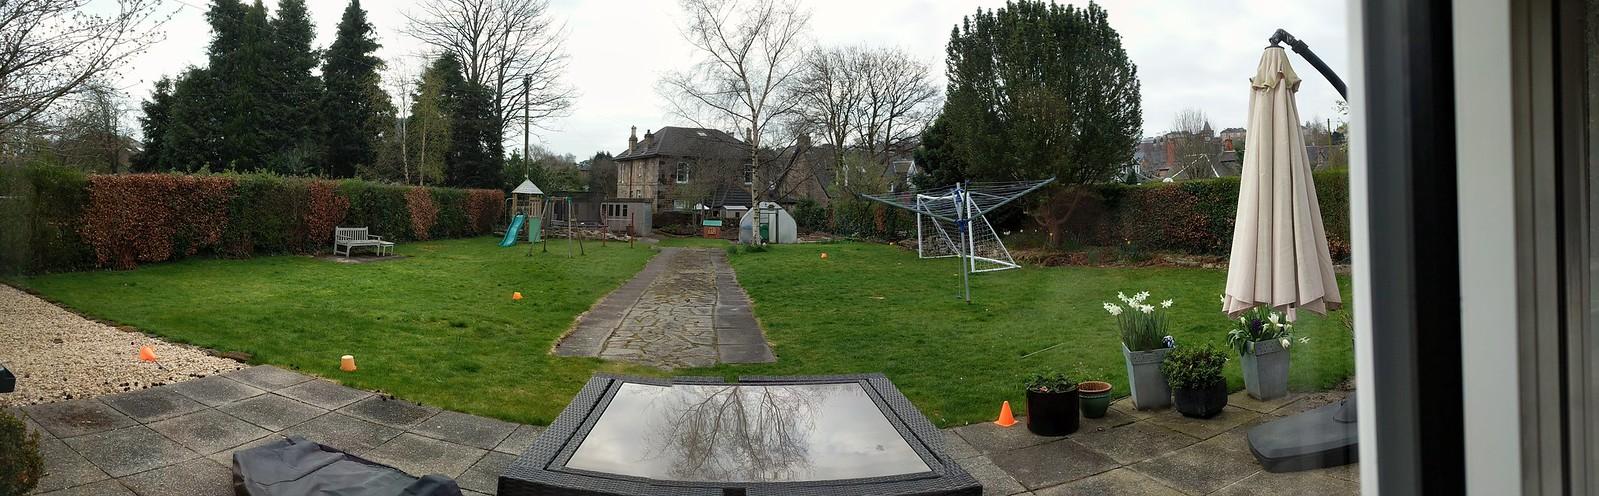 pump track in garden singletrack forum